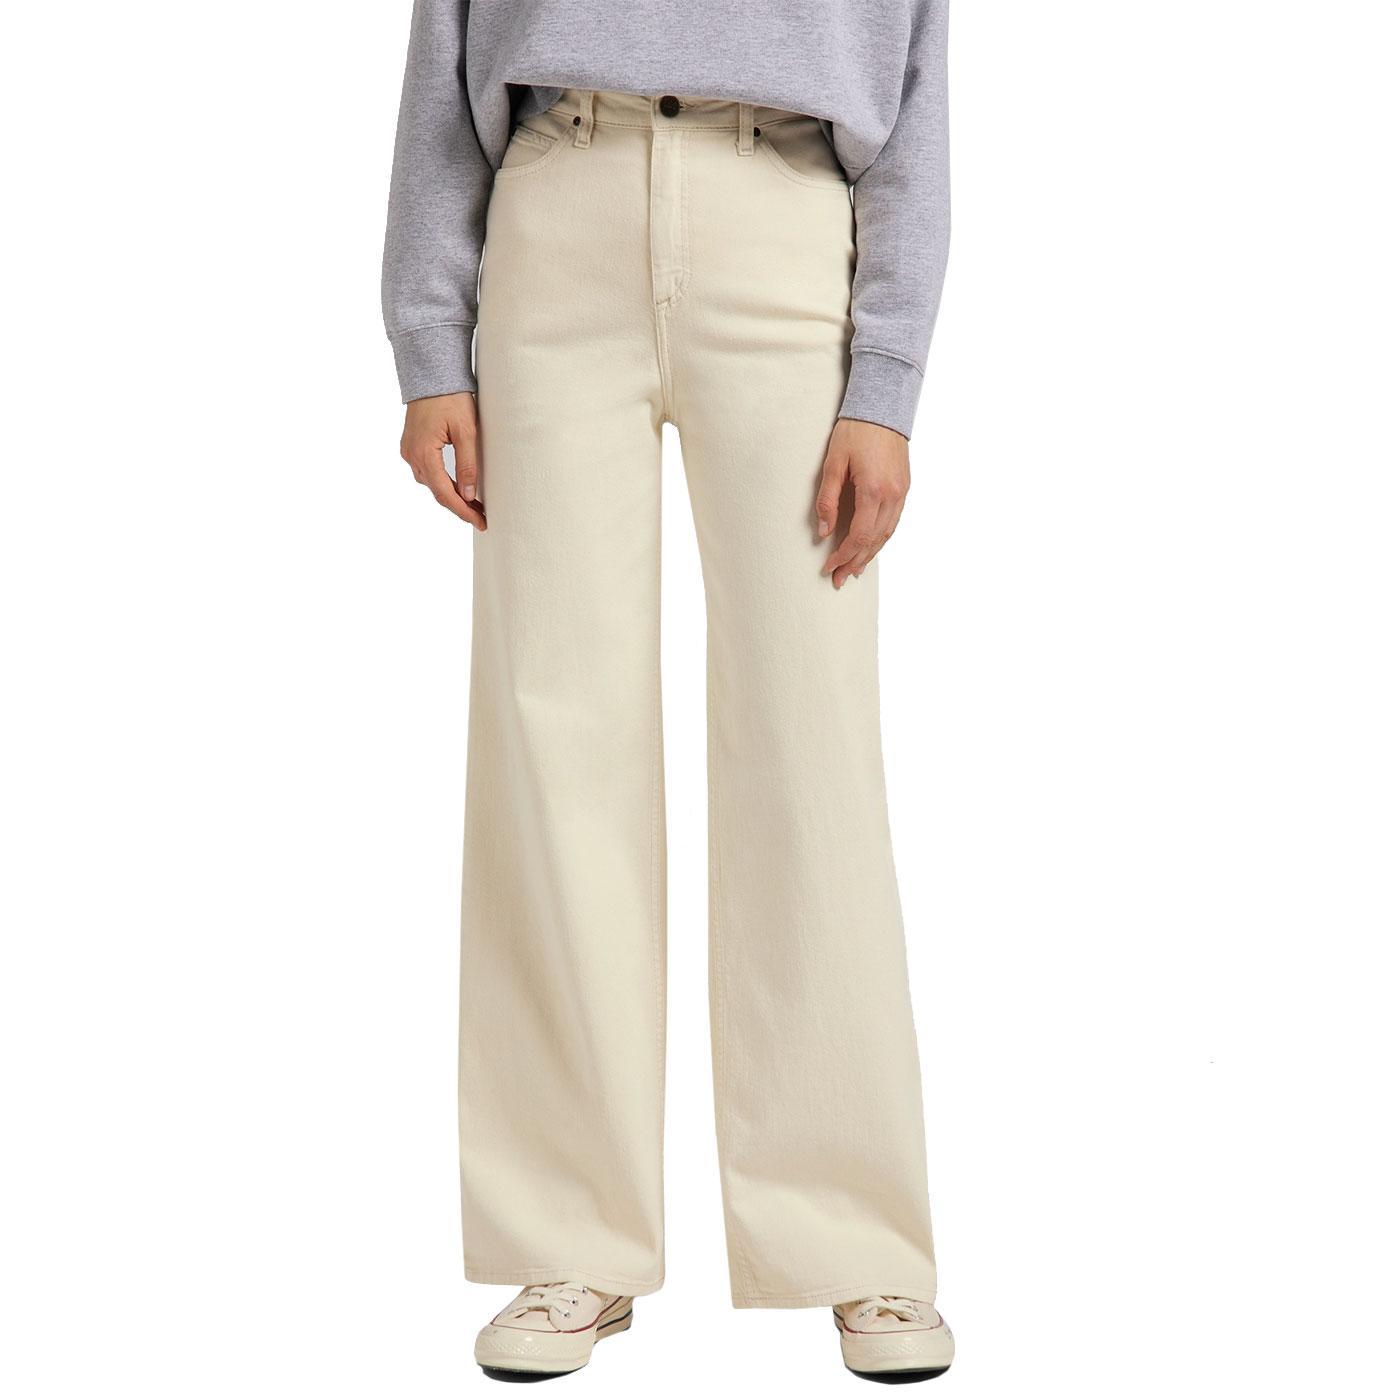 Stella LEE JEANS Womens A-Line Denim Jeans - Ecru